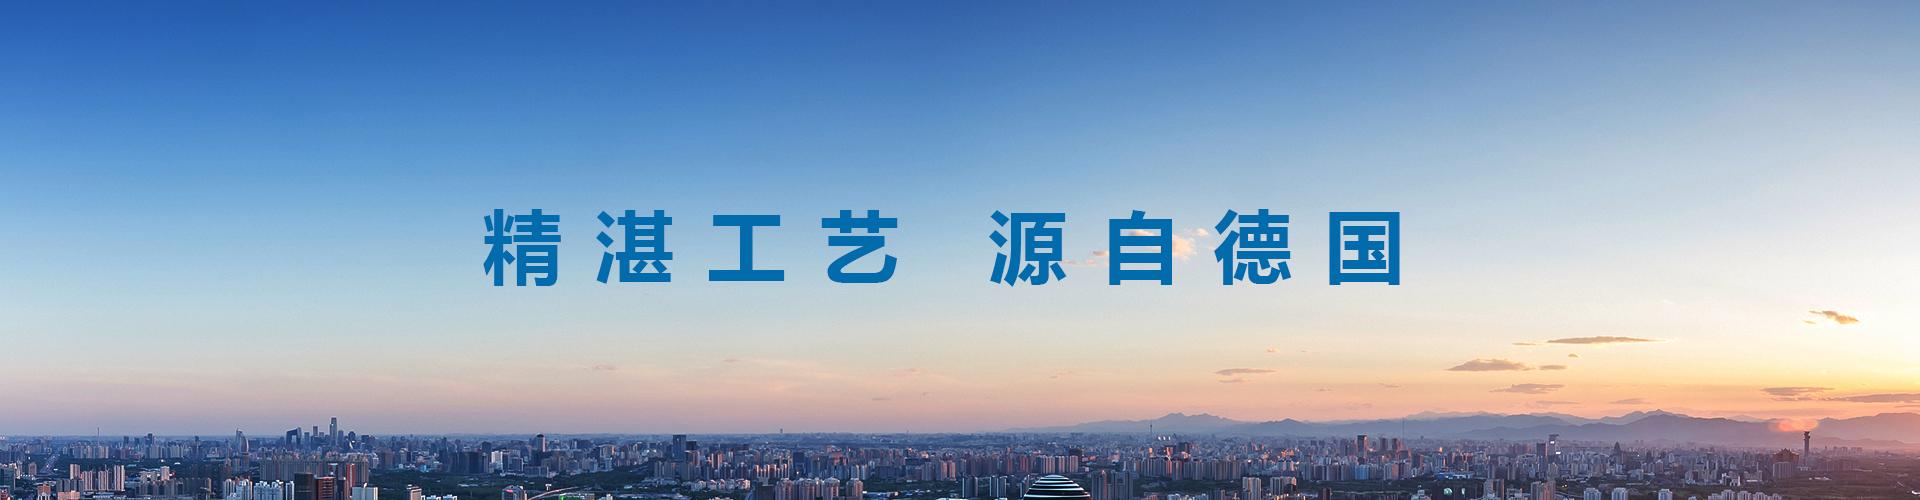 http://www.hunanxljx.com/data/upload/202101/20210104162616_246.jpg